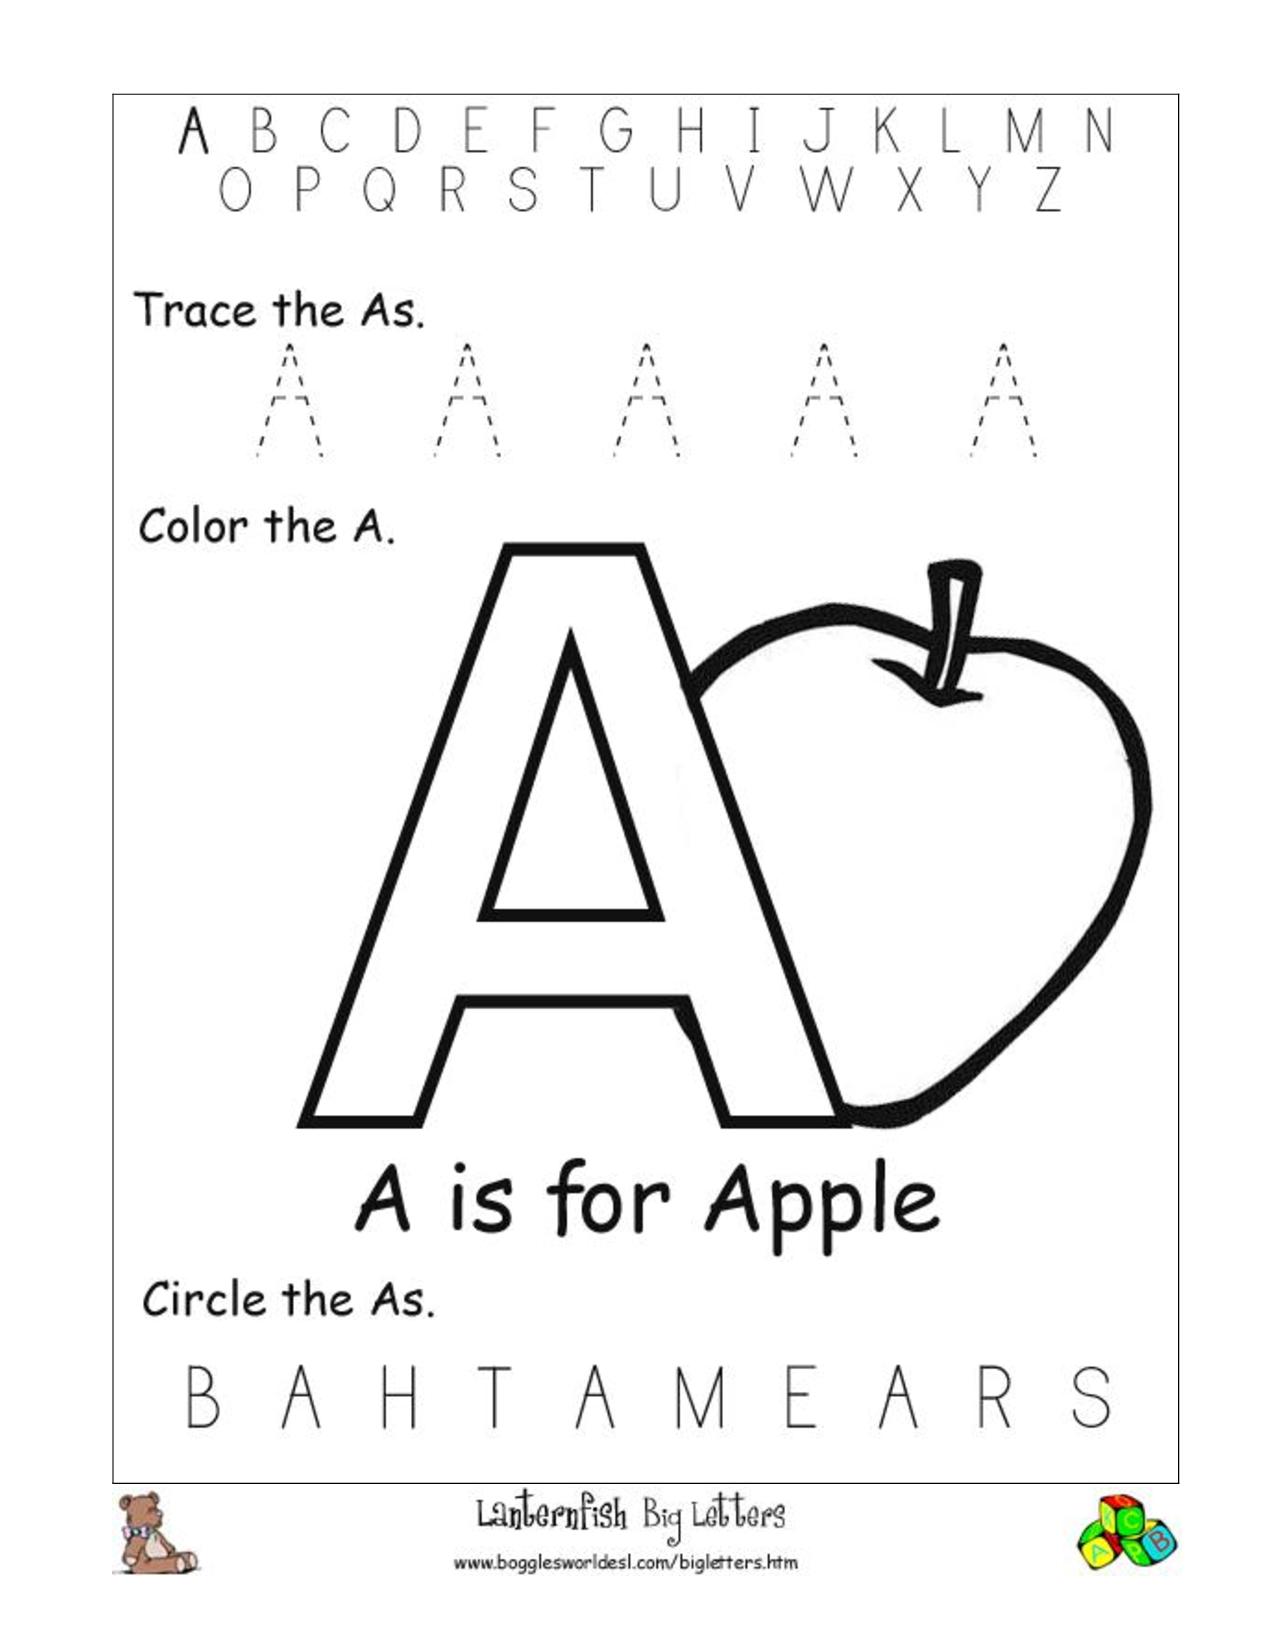 17 Images Of Alphabet Recognition Worksheets Printable regarding Pre-K Alphabet Recognition Worksheets